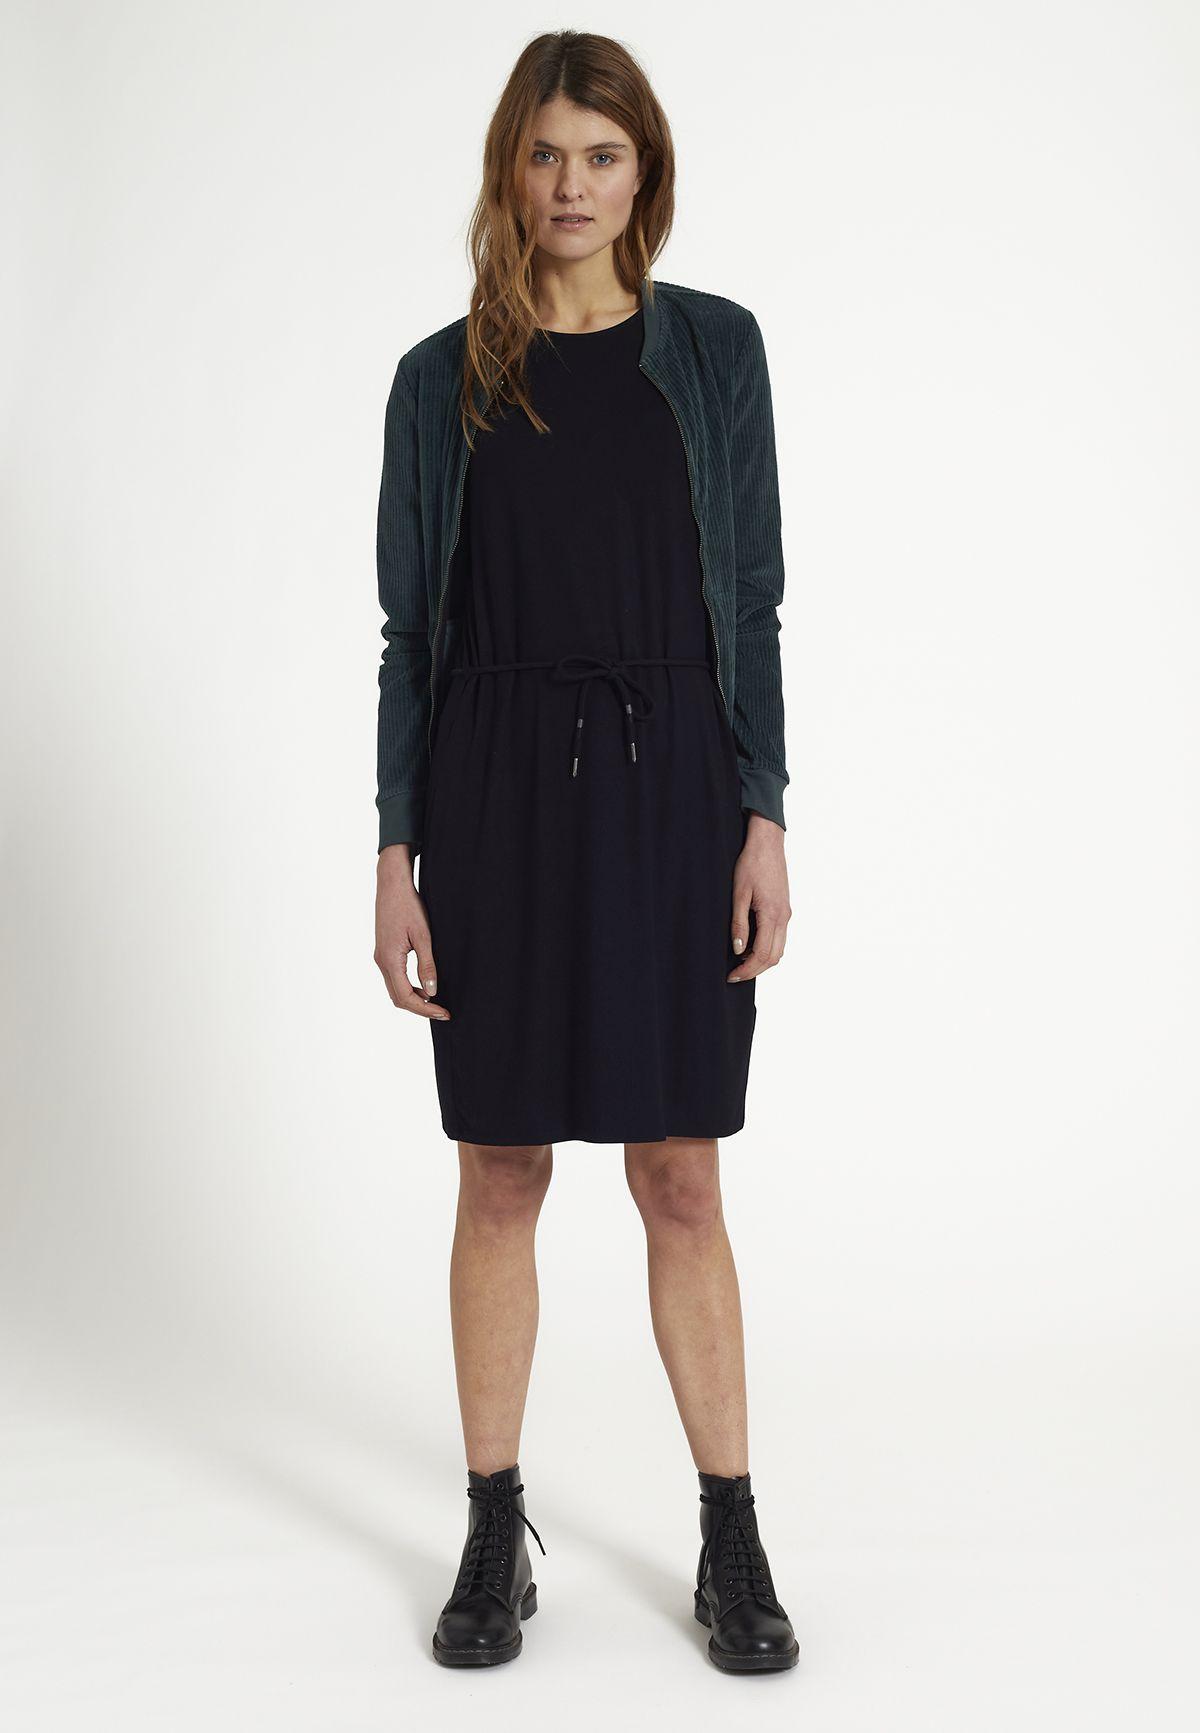 Damen-Kleid ARALIA black